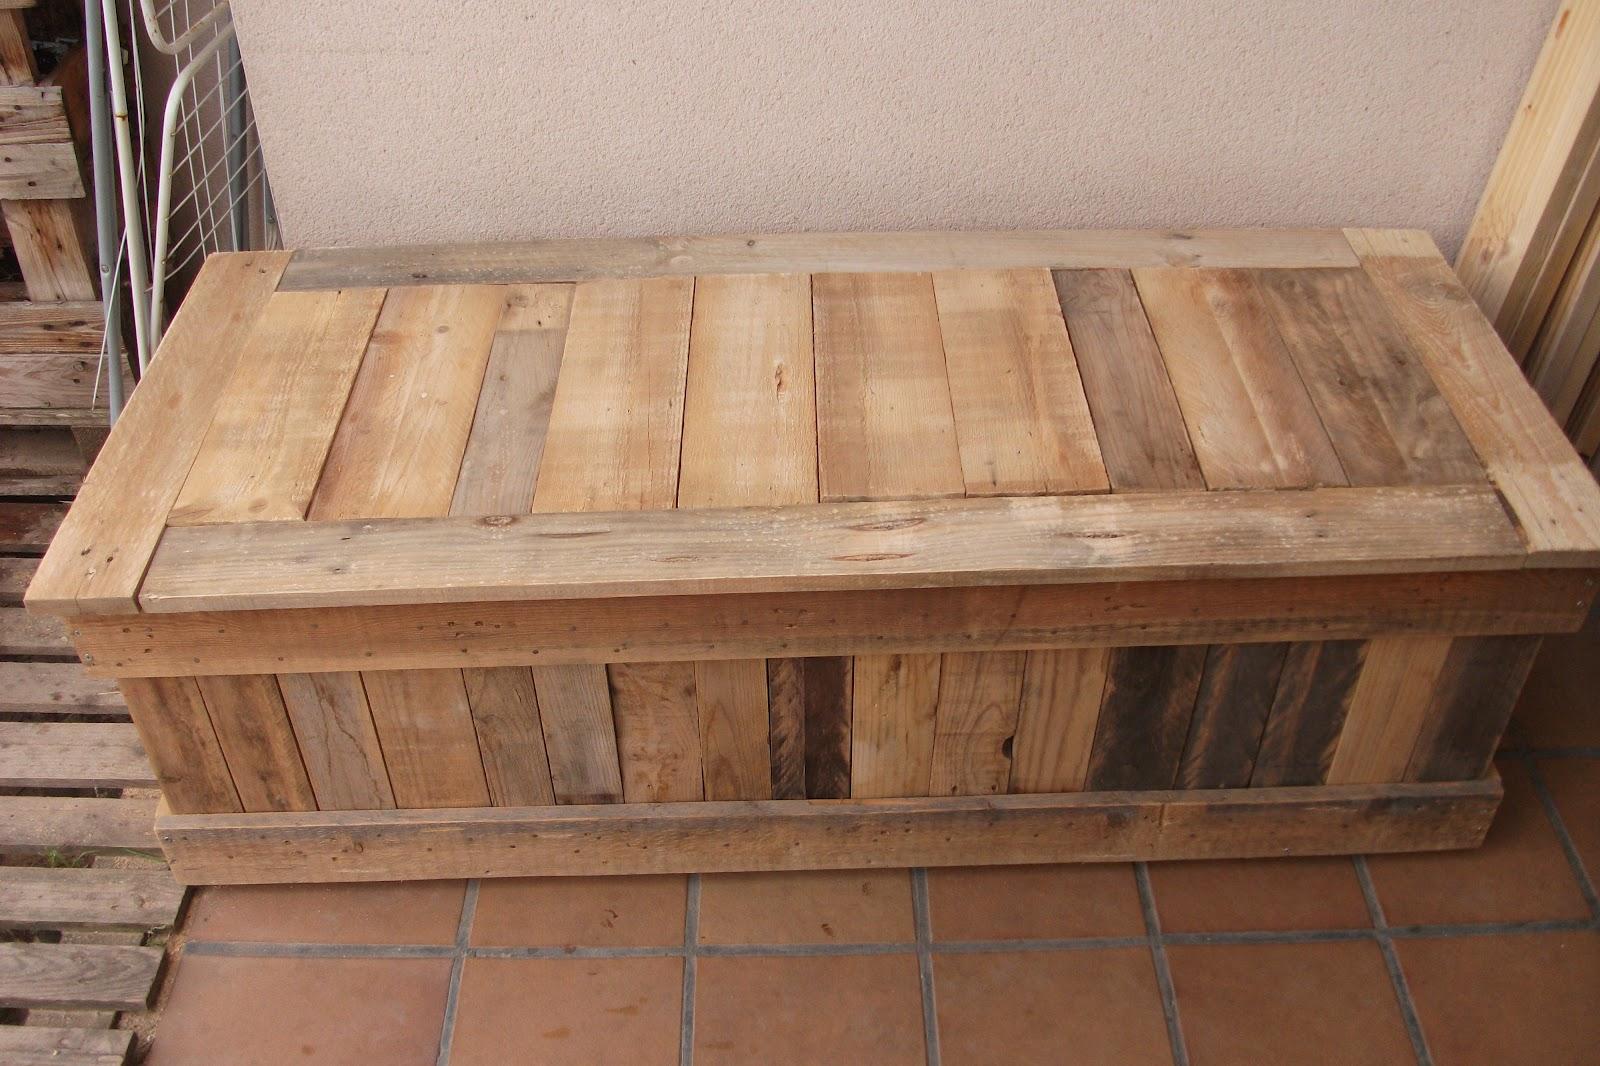 Reciclar palet stunning reciclar palets de madera with - Ideas para reciclar unos palets ...